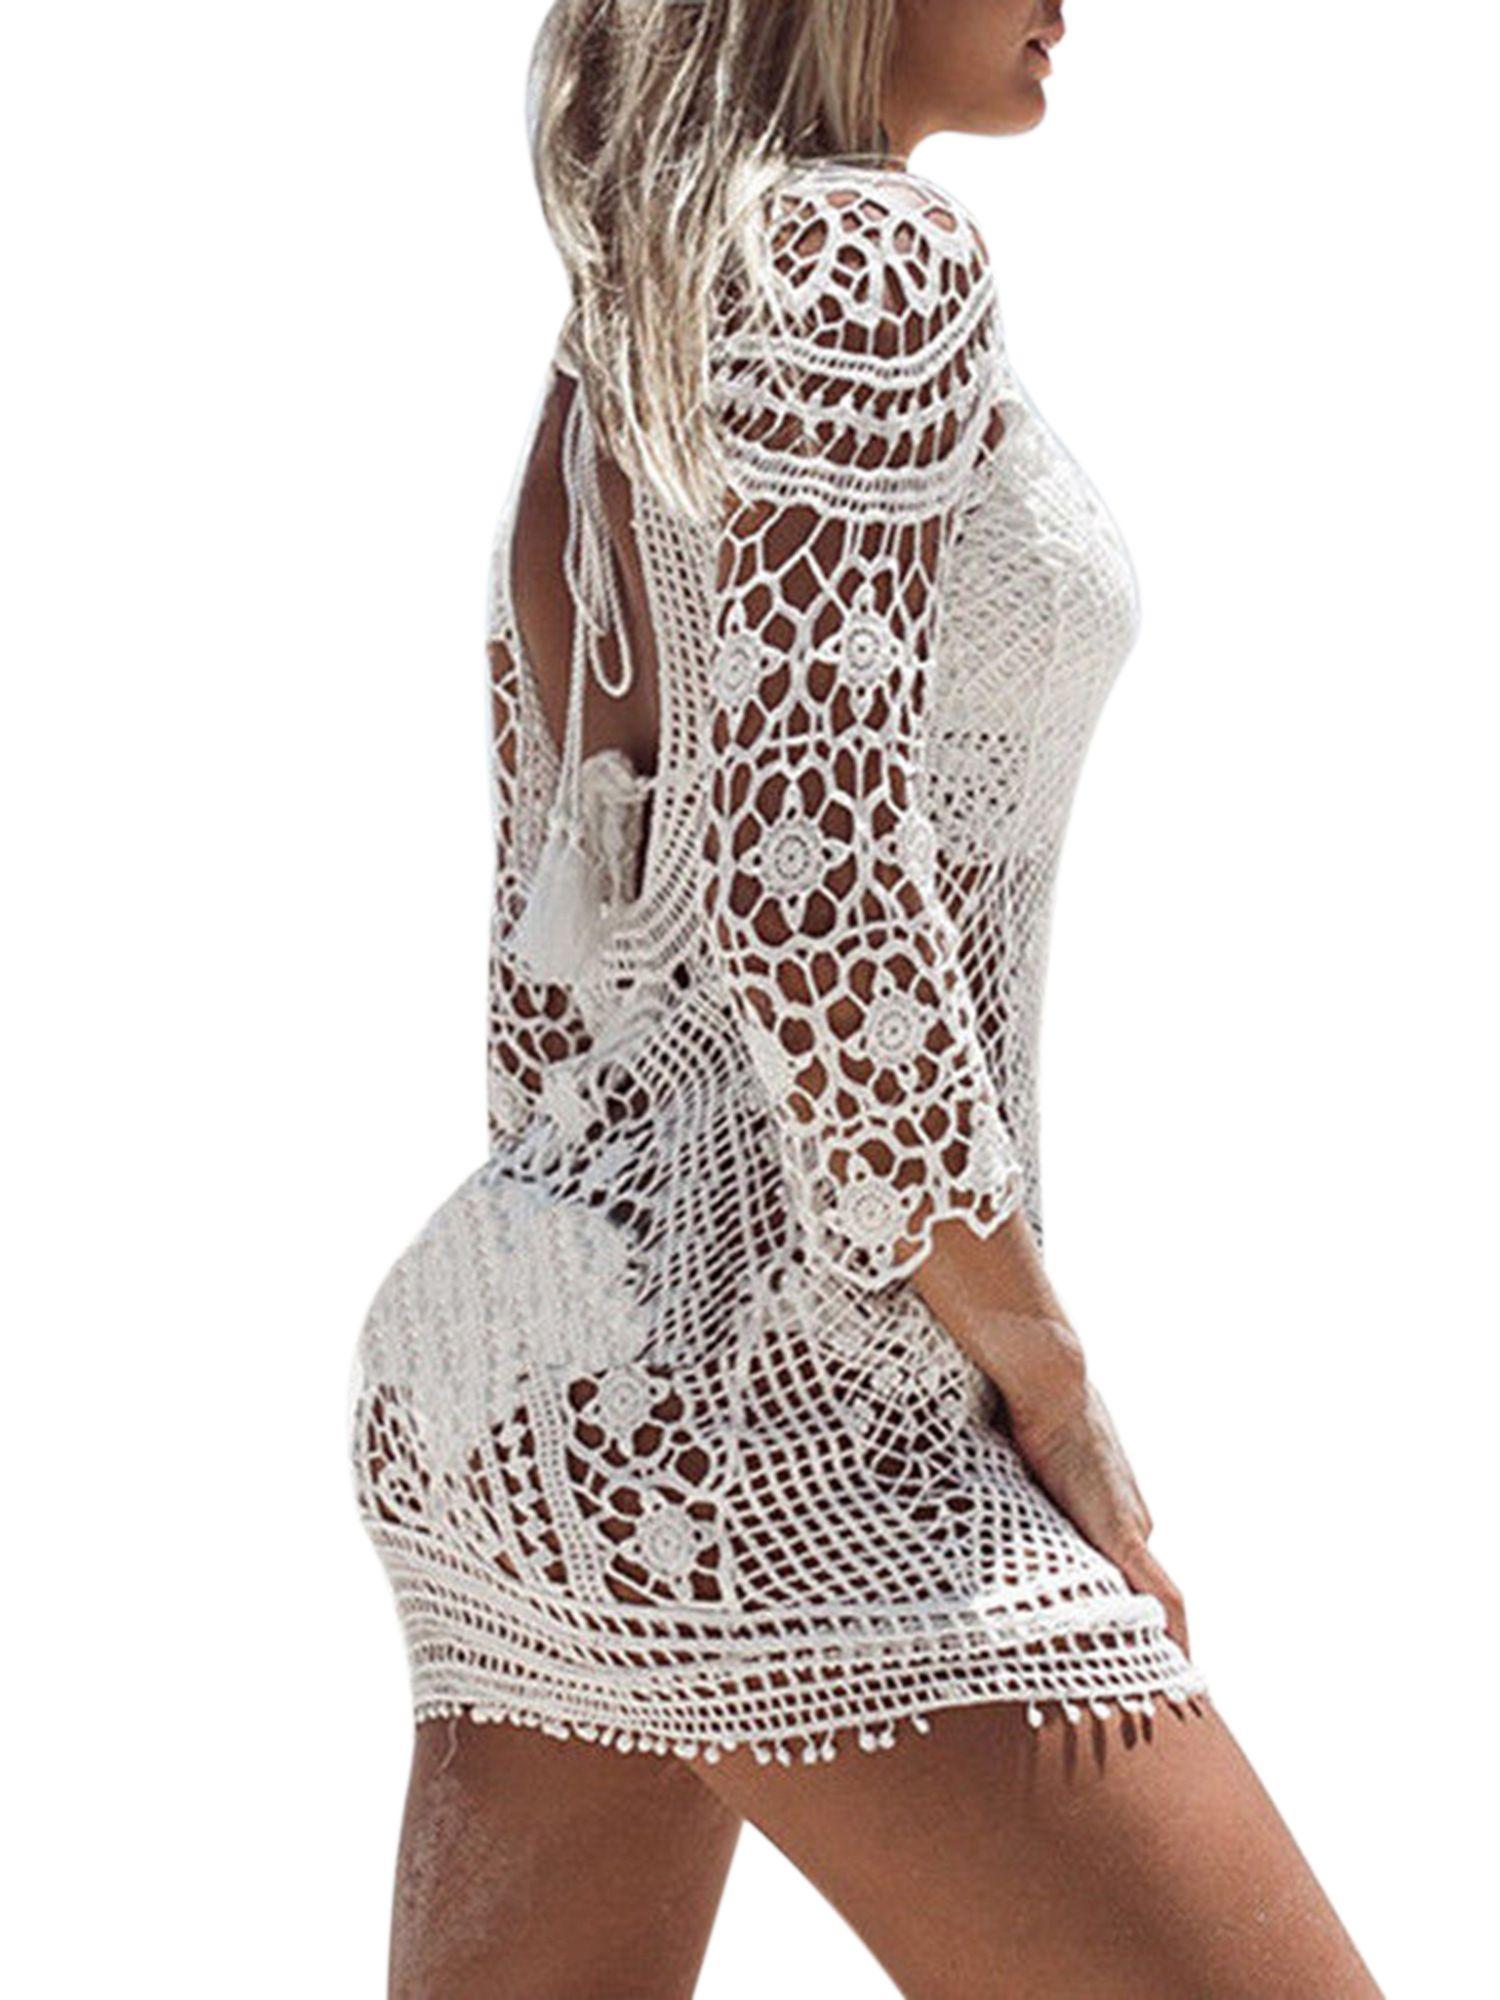 e87312801c Women Long Sleeve Lace Crochet Backless Beach Cover Up Dress Summer Holiday Bikini  Swimsuit Hollow Bathing Suit Swimwear#Backless, #Crochet, #Cover